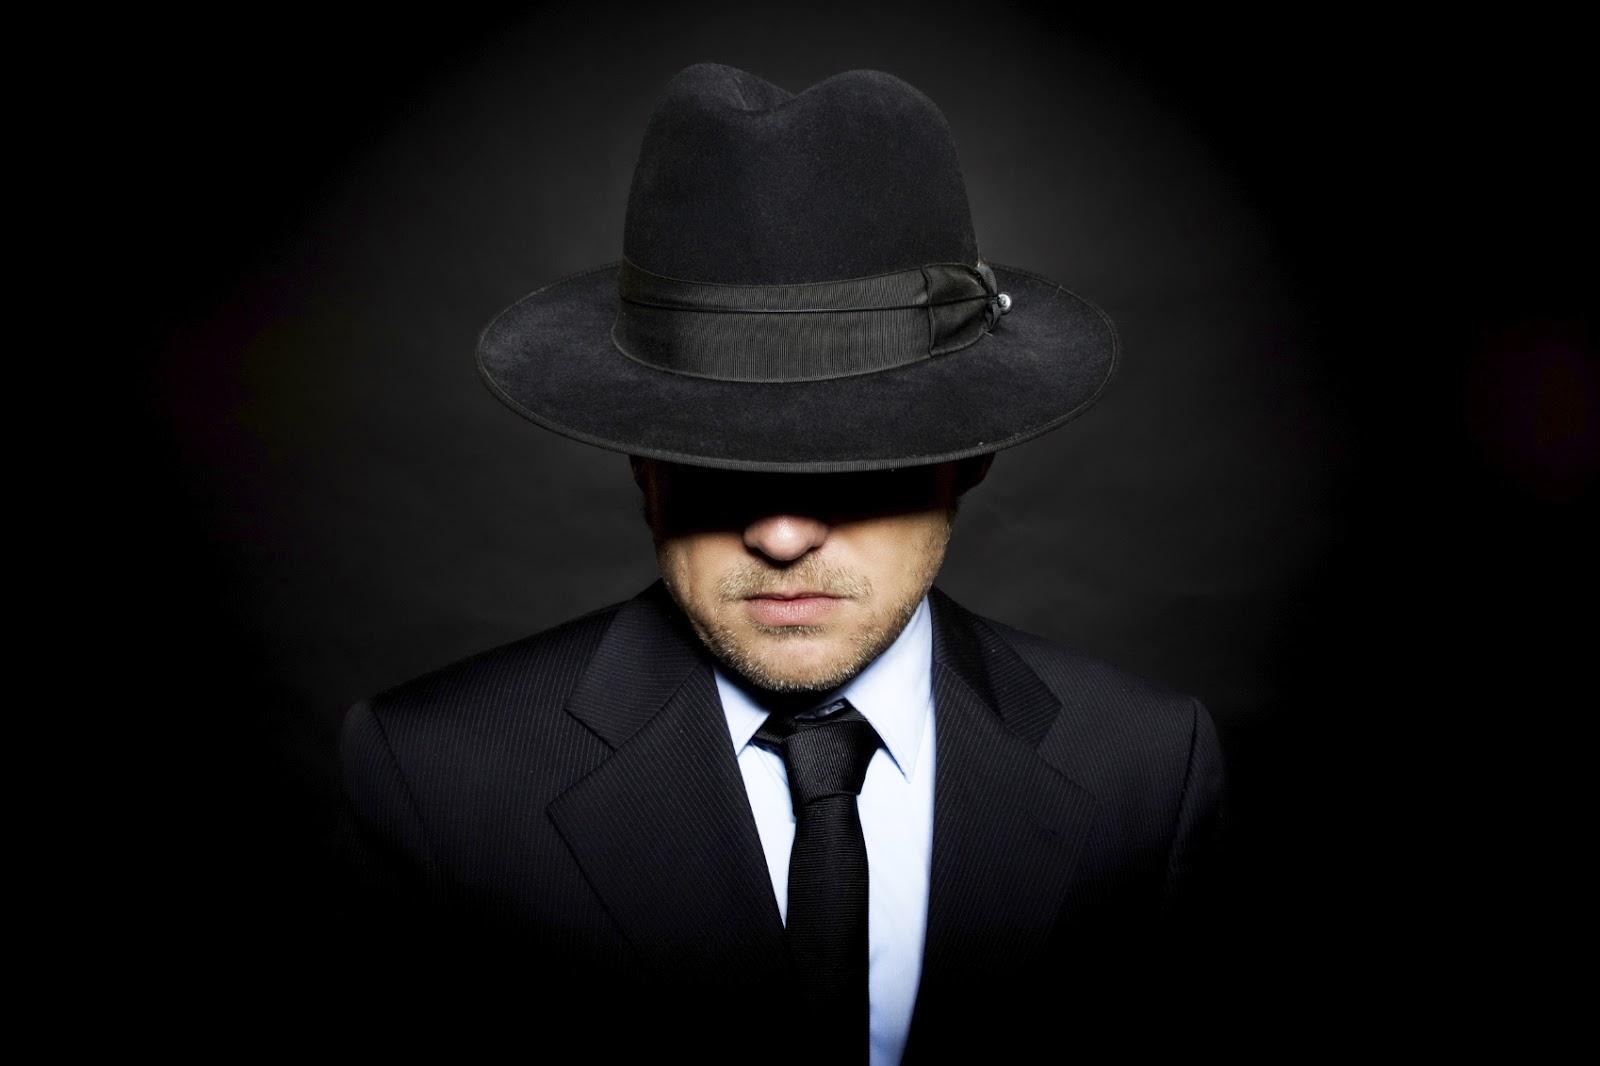 Black Hat Hackers | GoblinByte